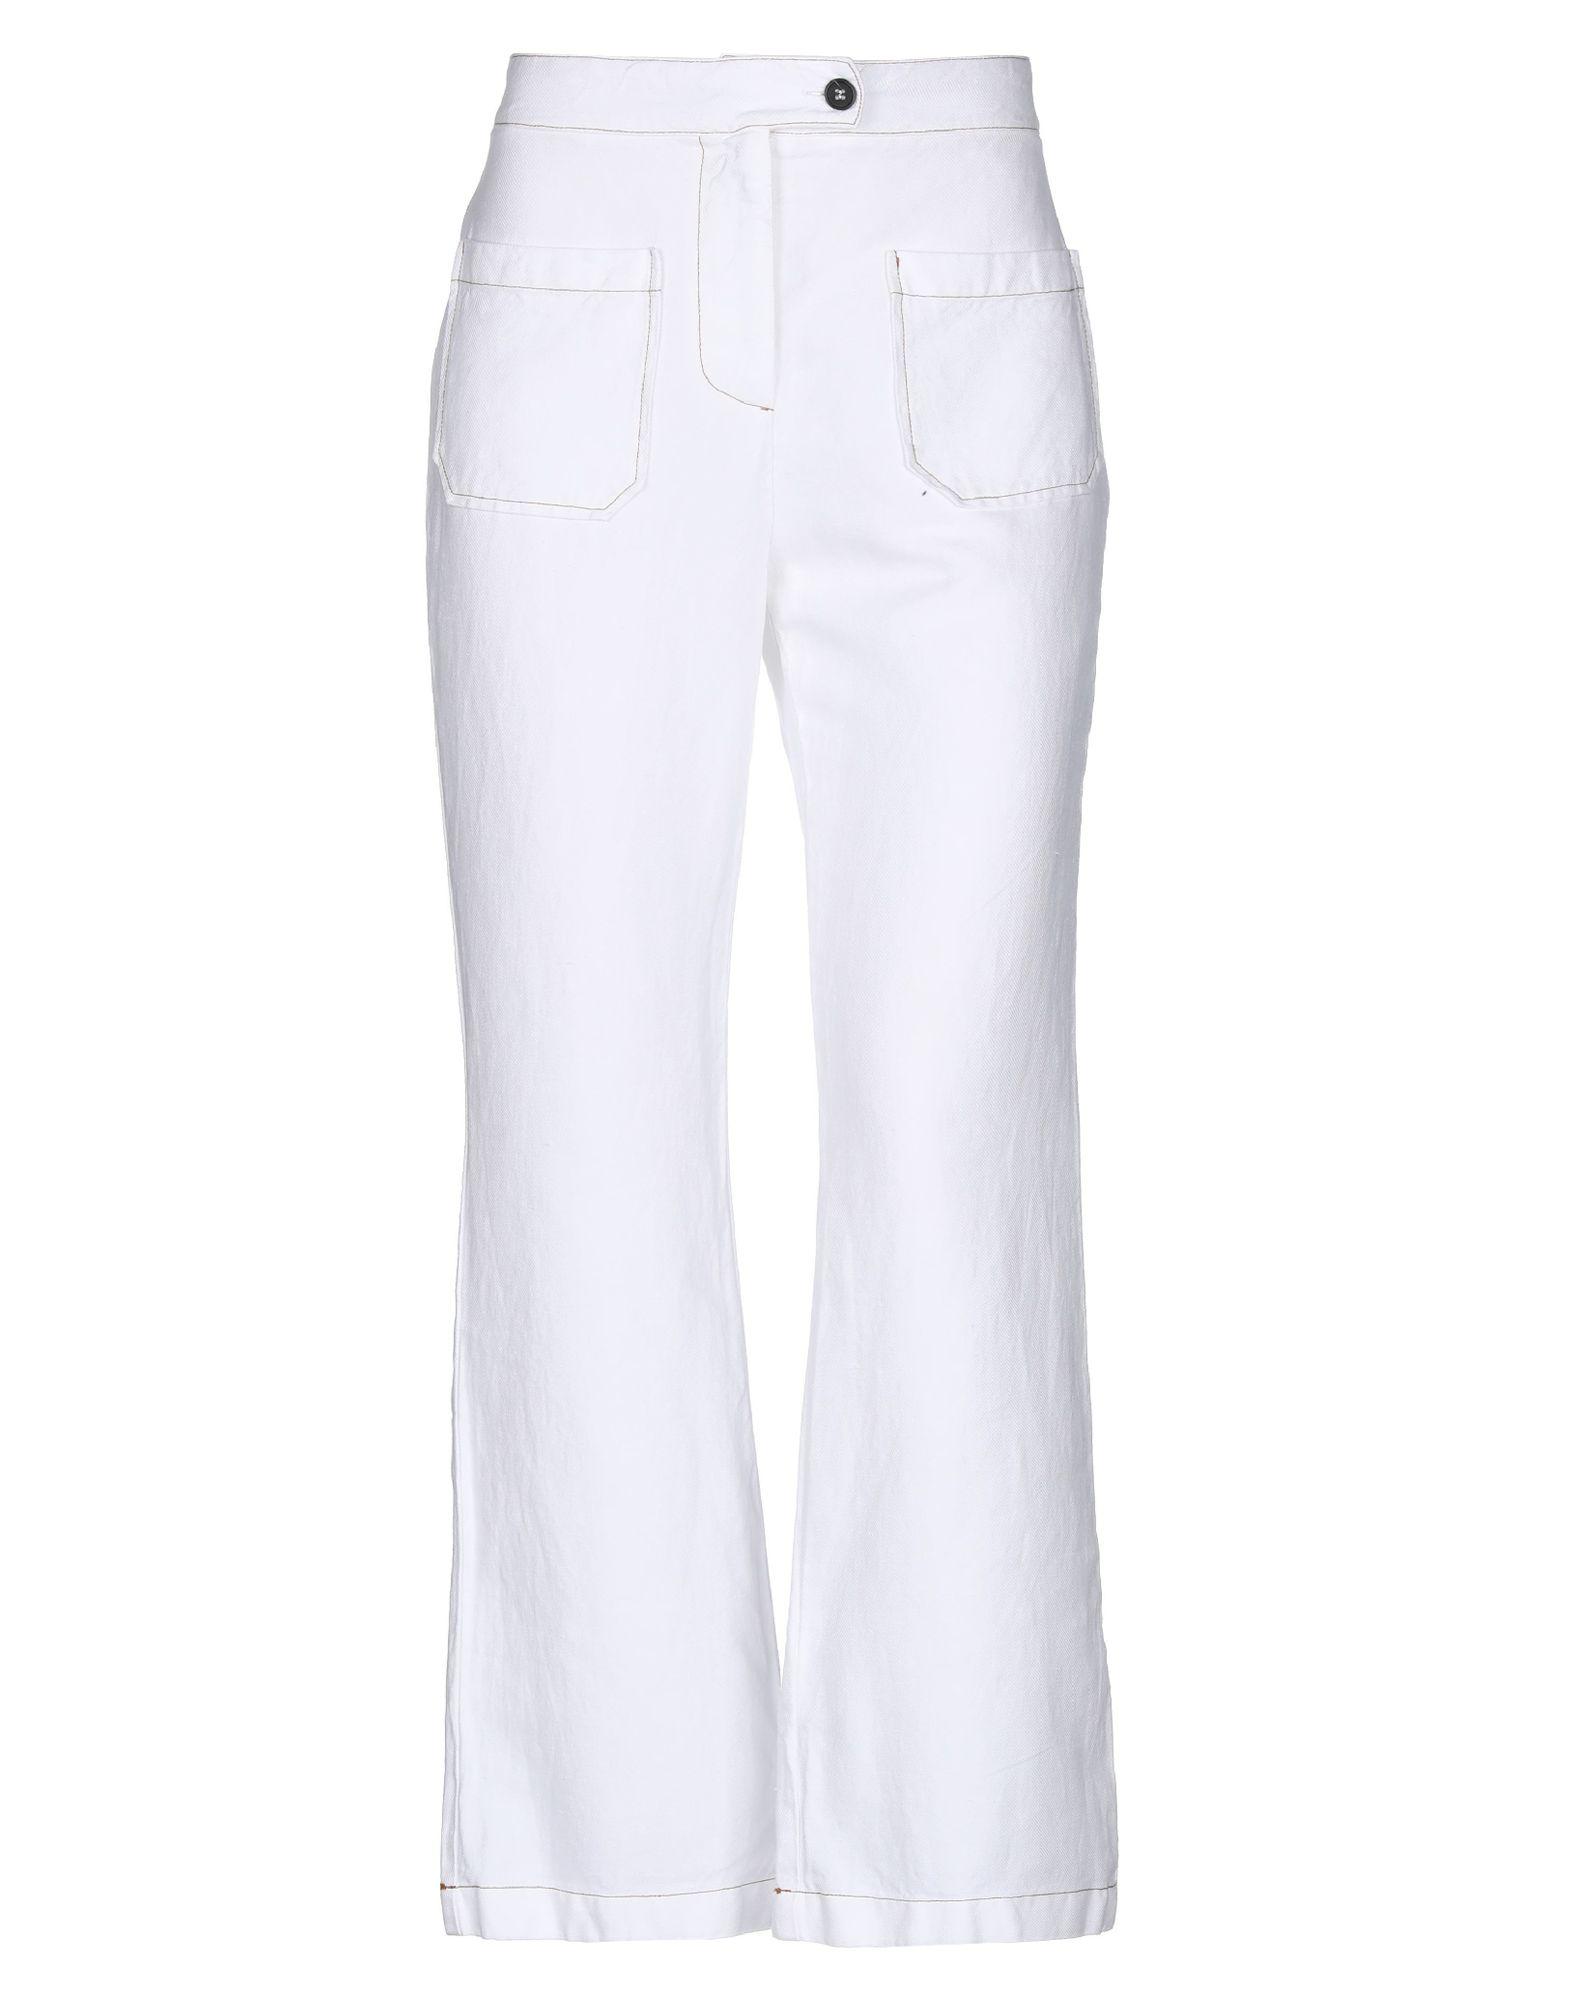 COLLECTION PRIVĒE? Повседневные брюки collection privēe повседневные брюки page 4